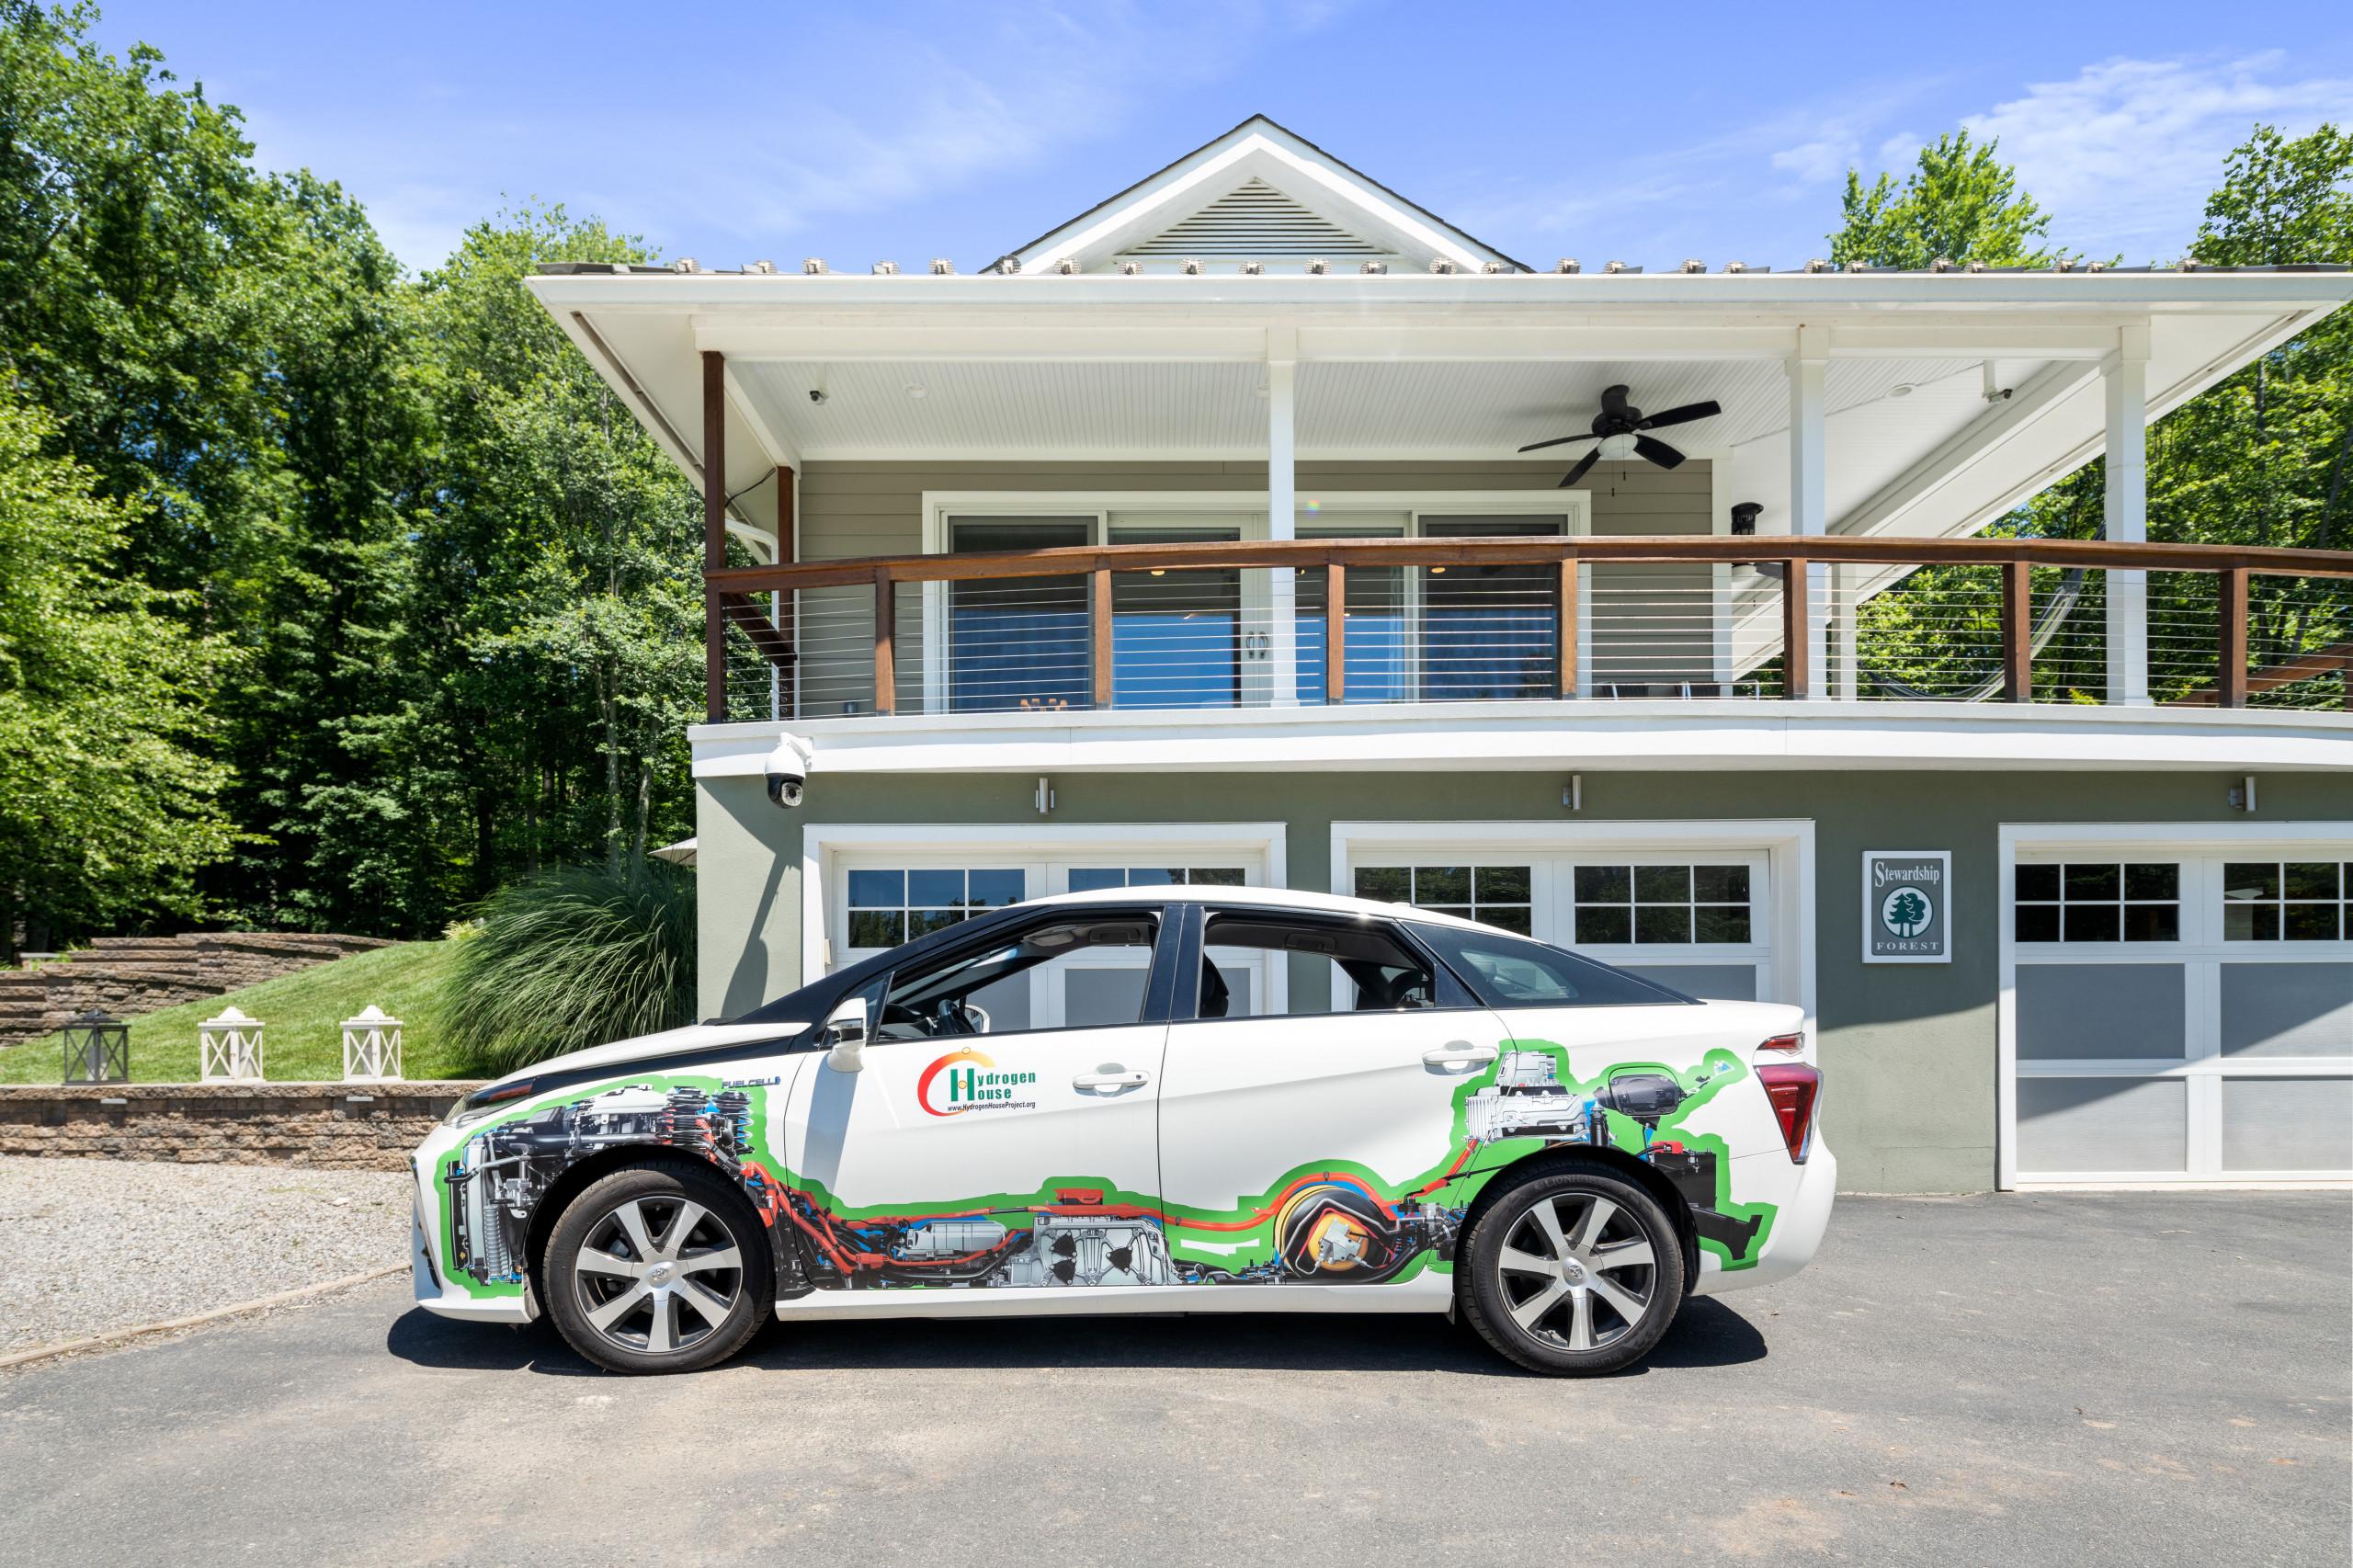 house for sale Pennington off-grid hydrogen-powered car